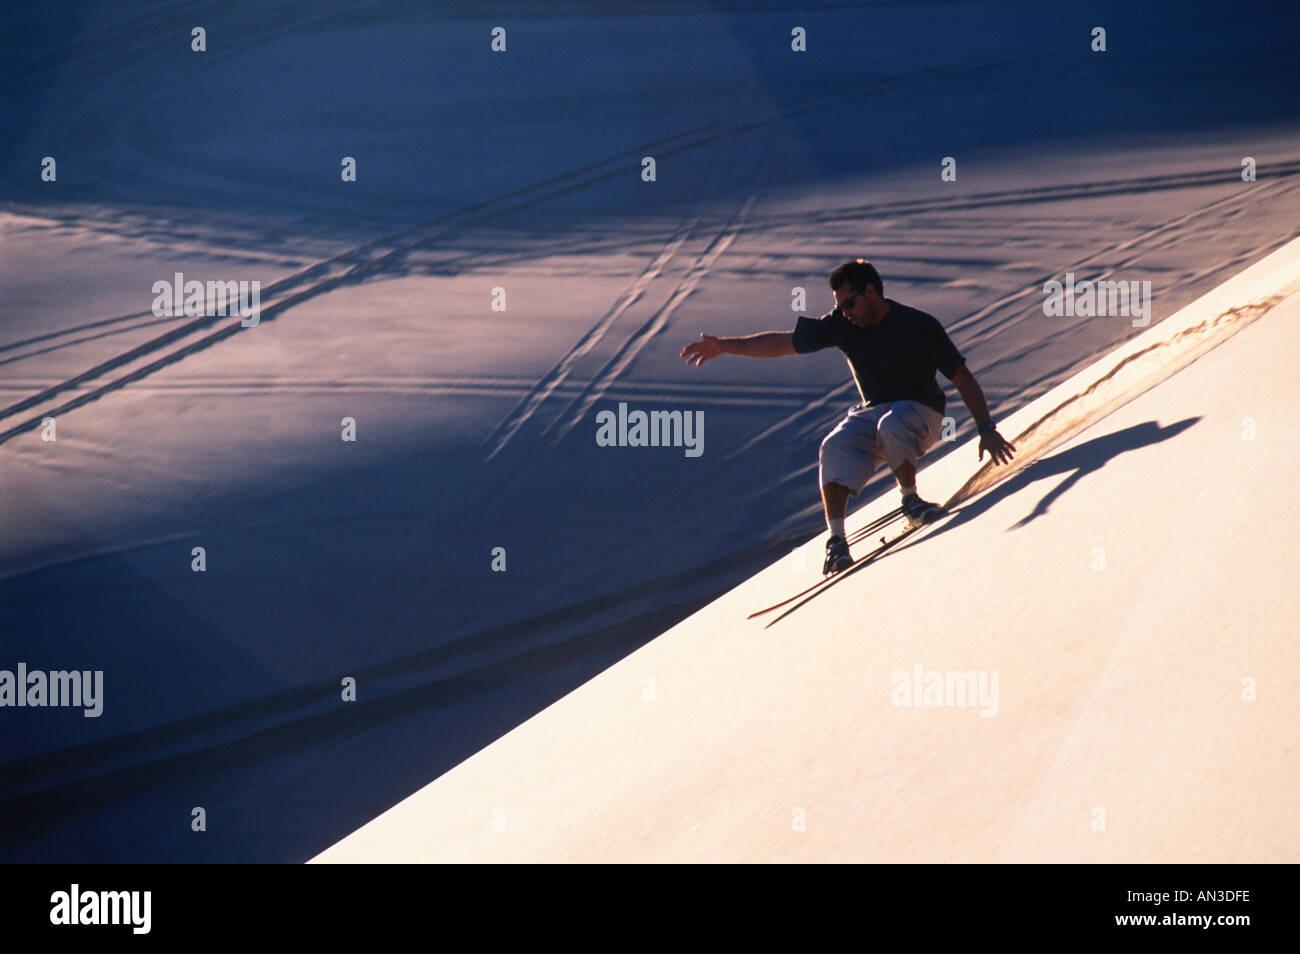 Sandboarding on a sand dune - Stock Image